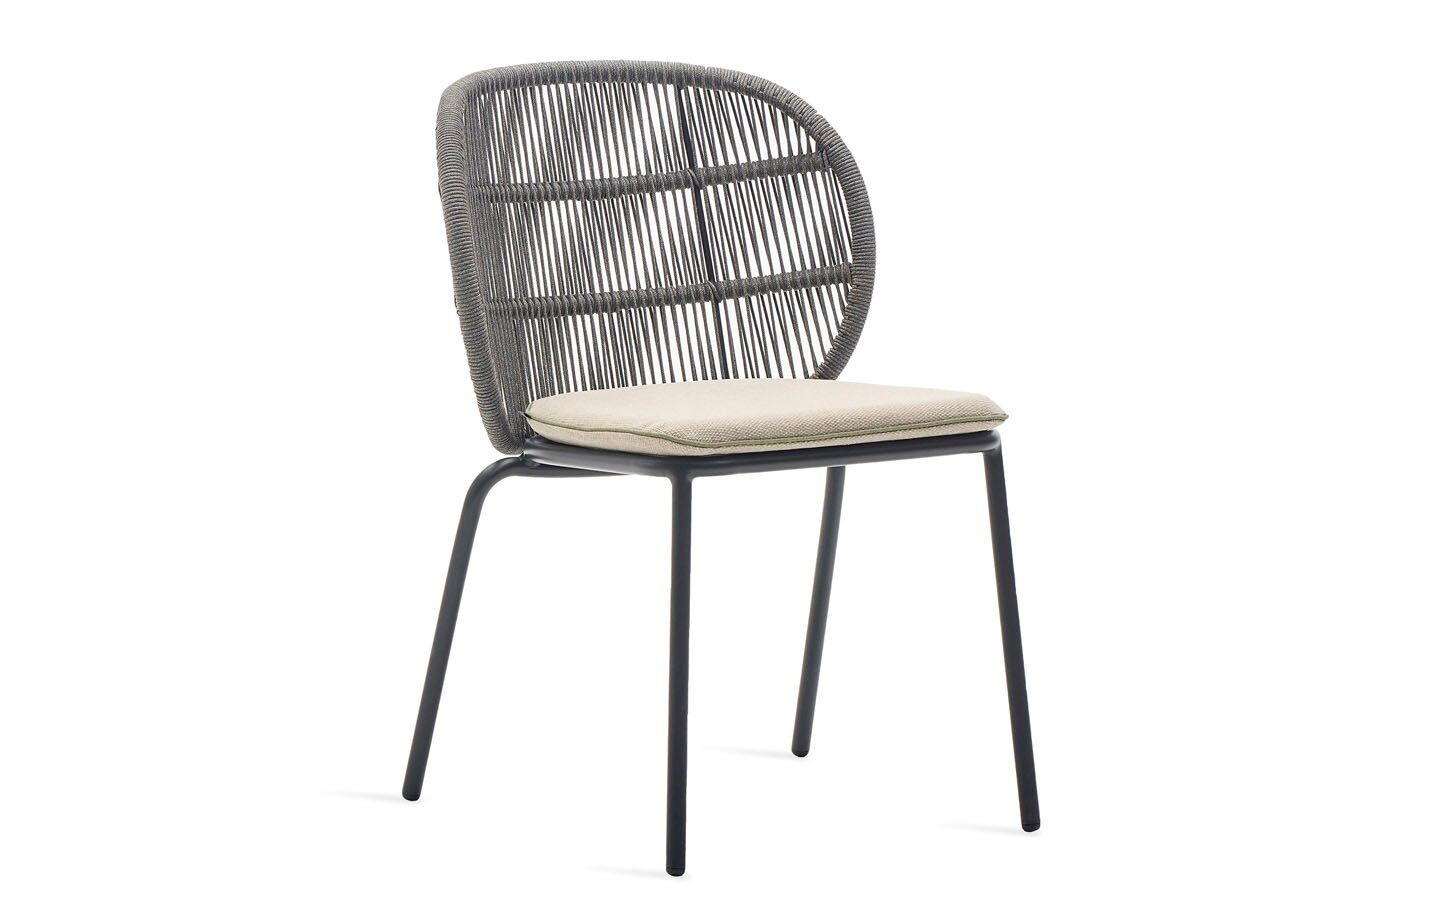 Kodo-dining-chair-outdoor-01